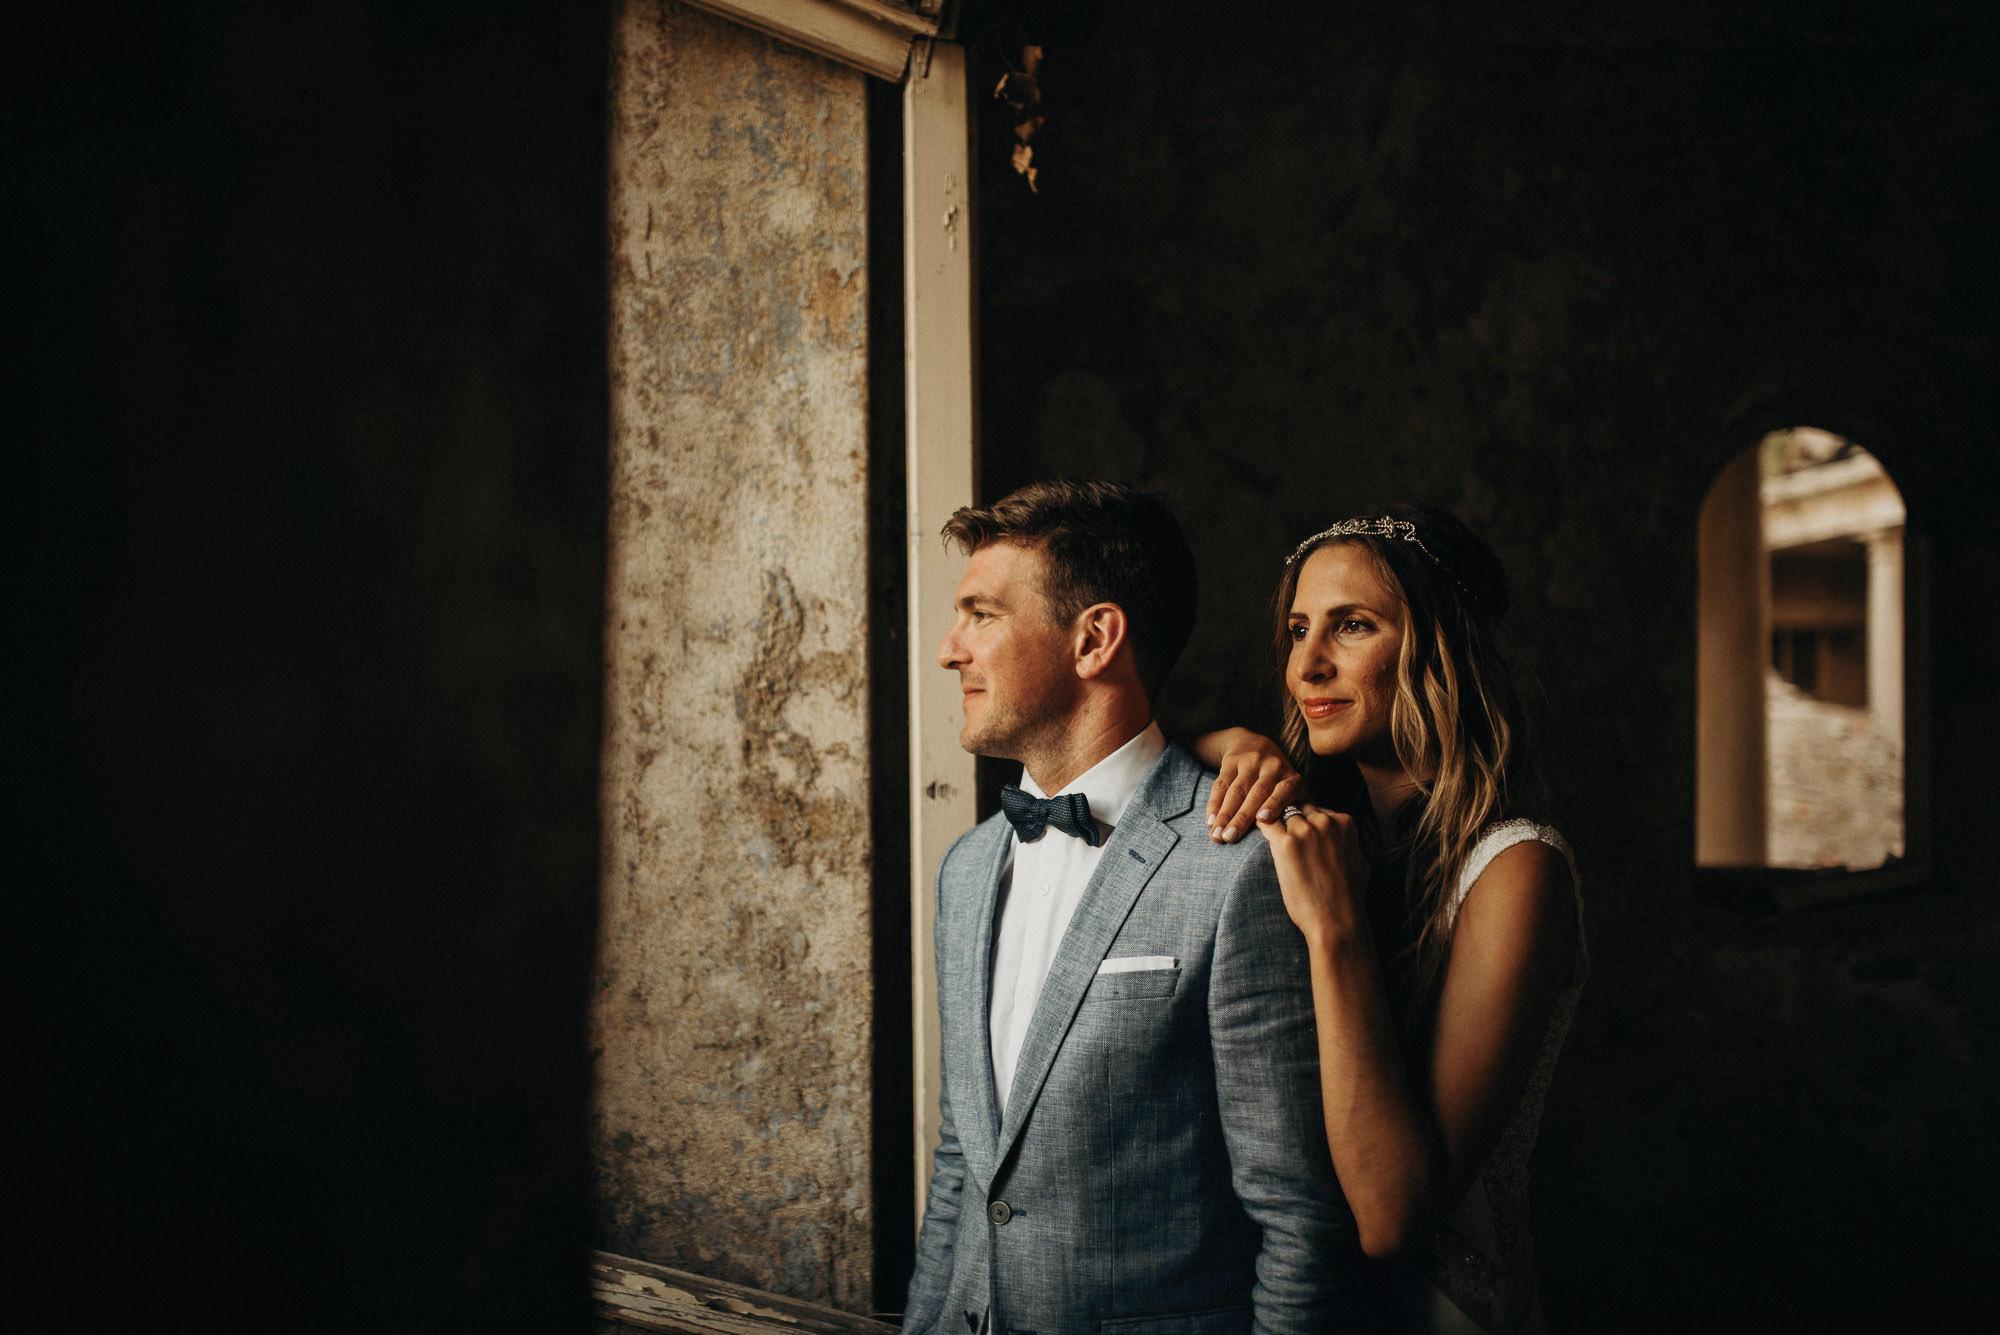 dubrovnik_croatia_wedding_photographer-jere_satamo-destination_weddings-109-web.jpg